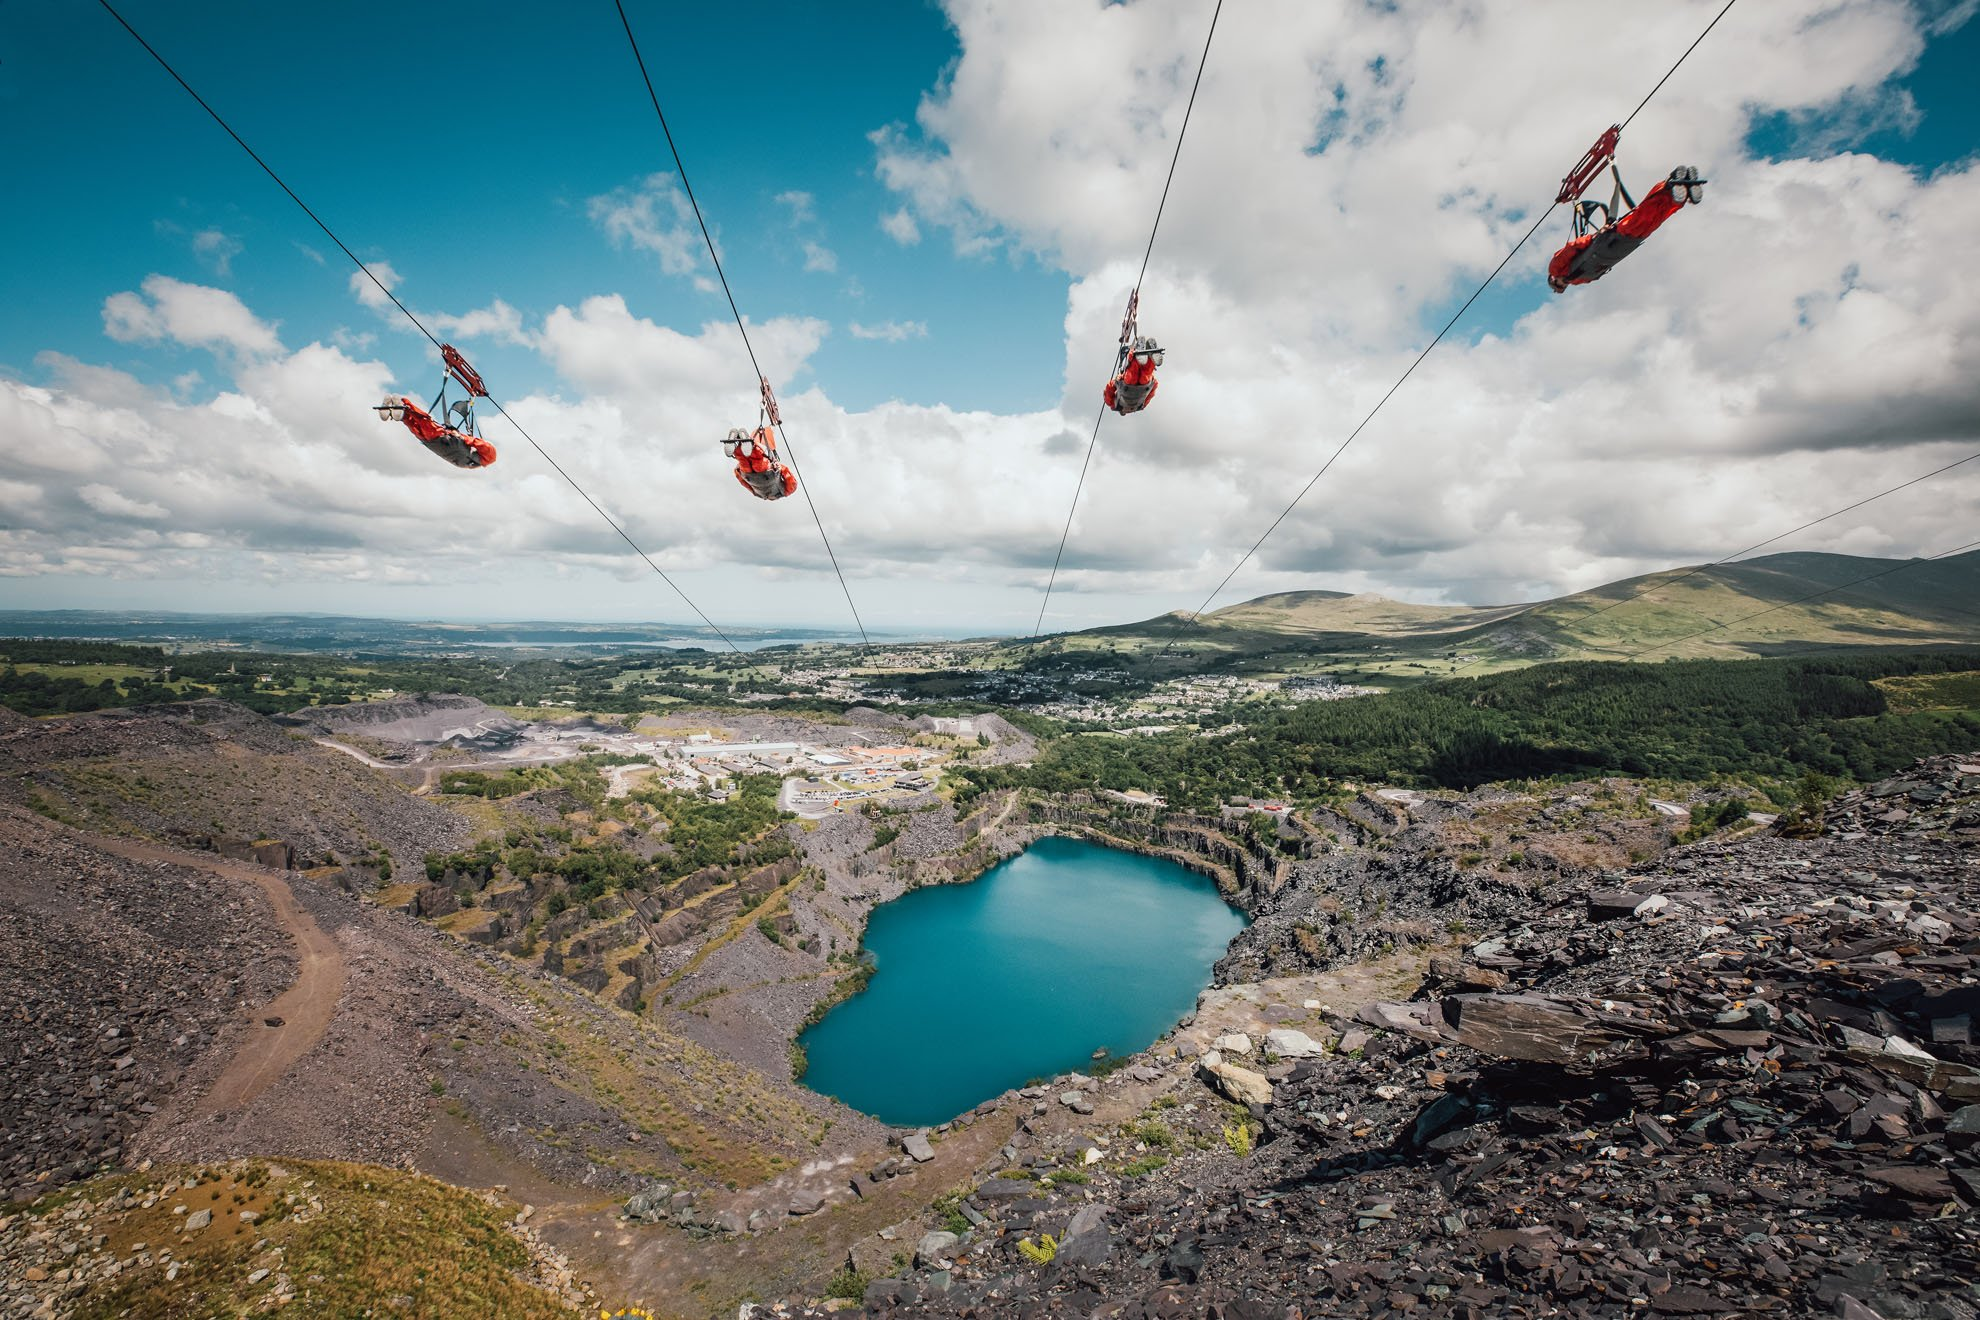 Zip World, North Wales